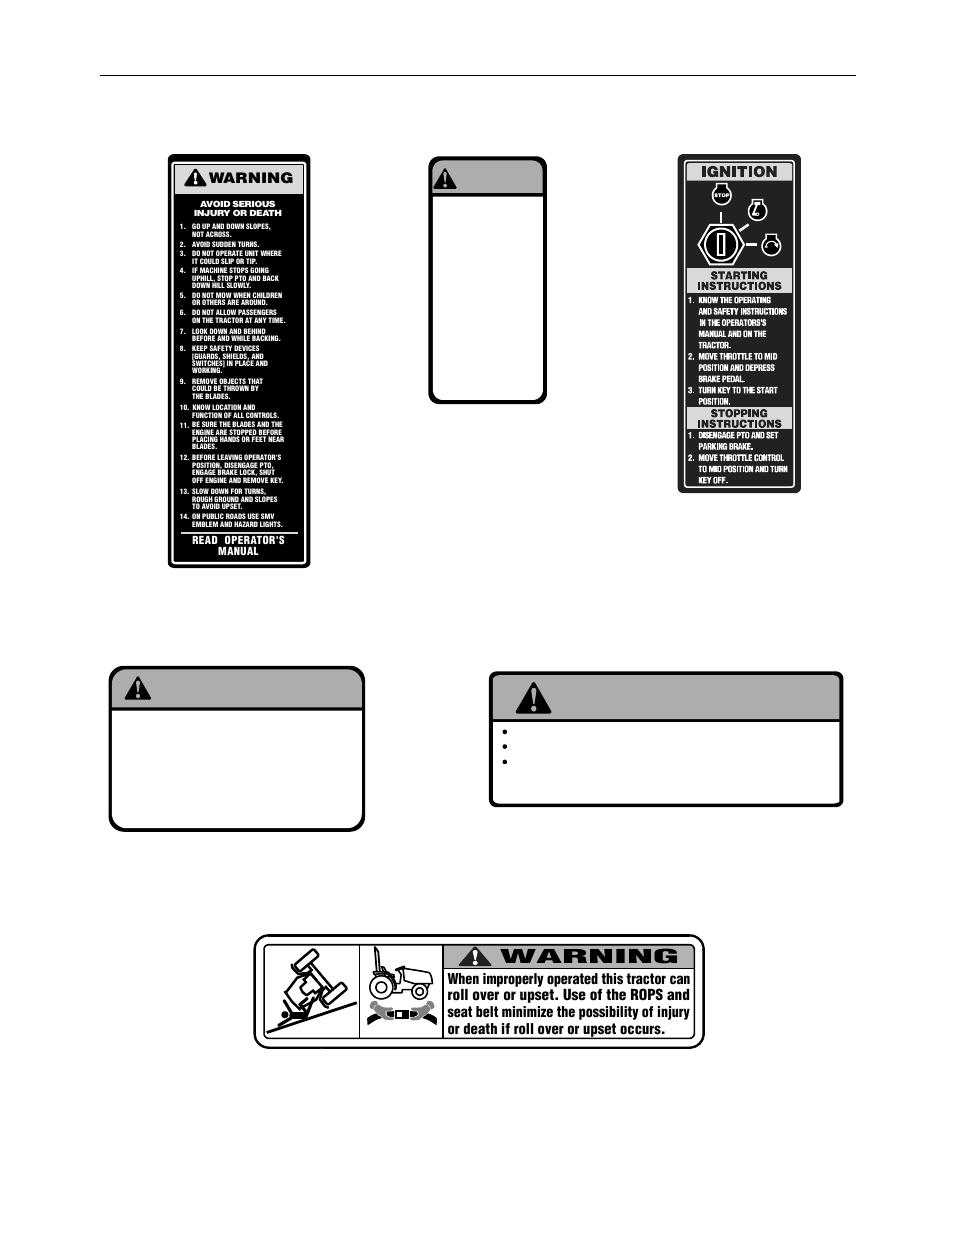 Safety labels, Instruction / warning label on left running